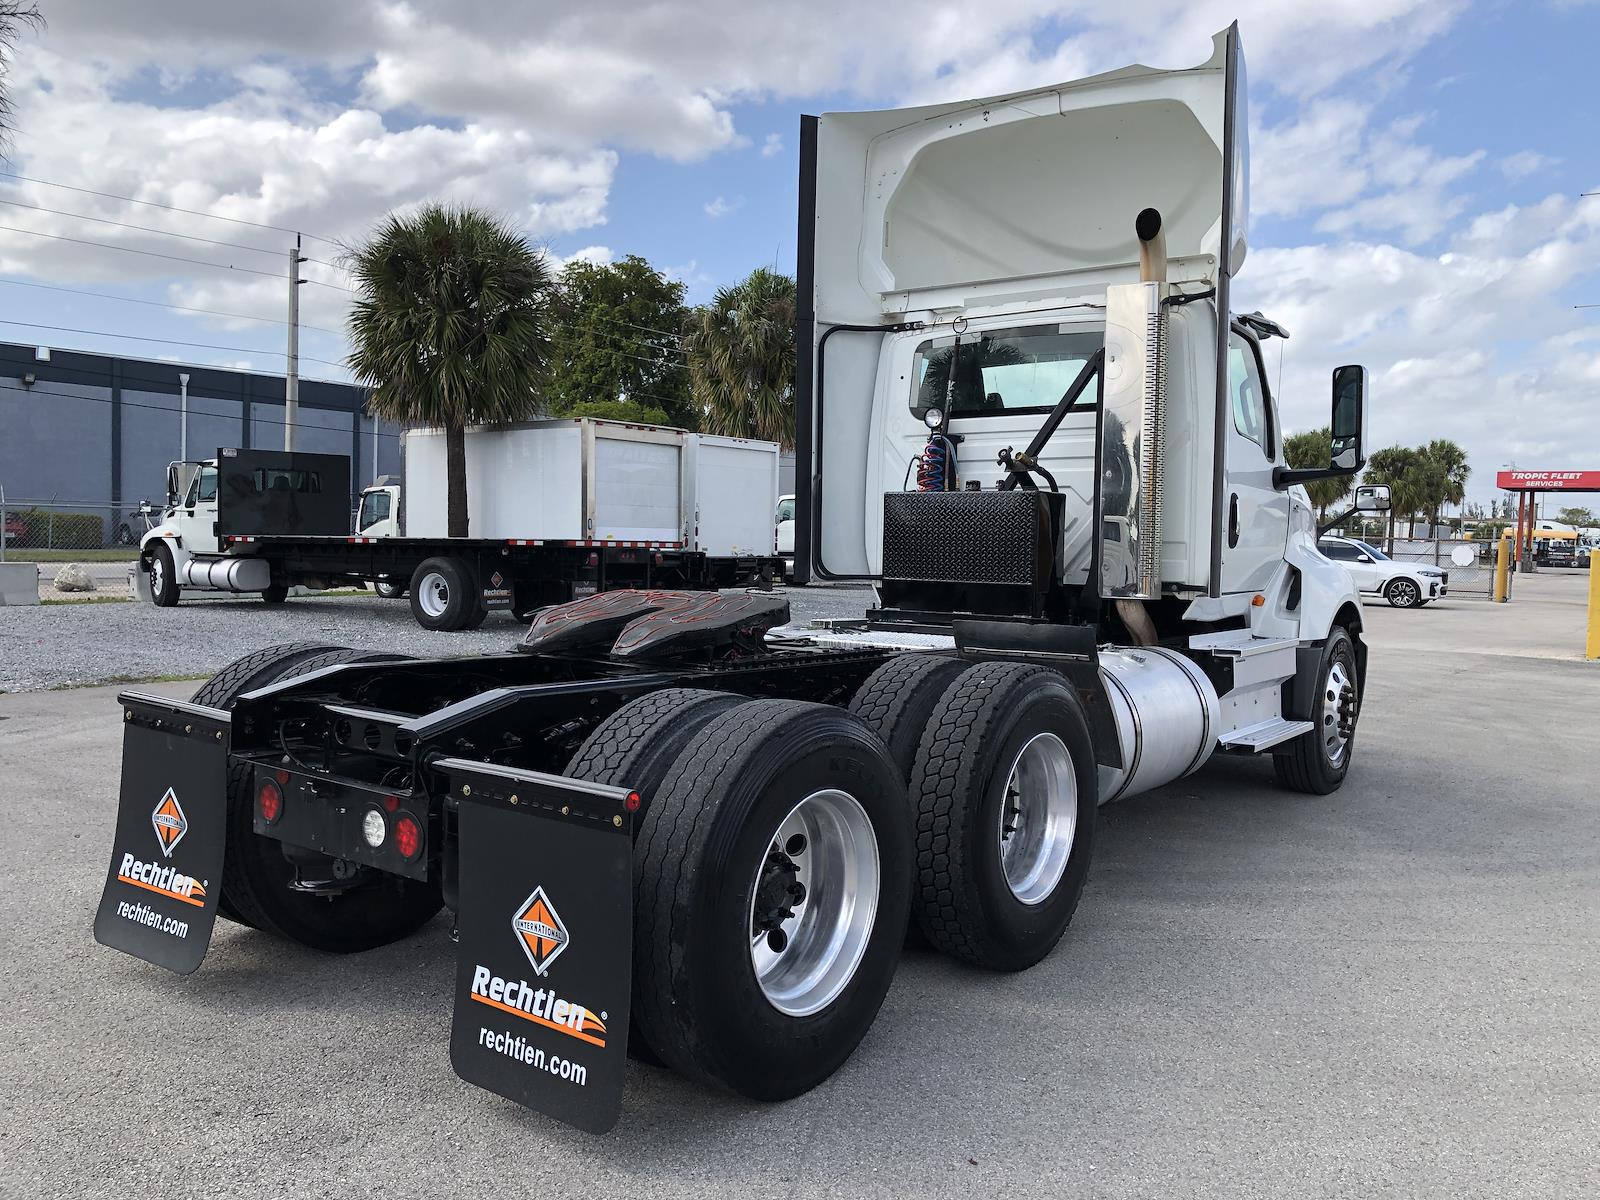 2018 International LT 6x4, Tractor #I-8264 - photo 1